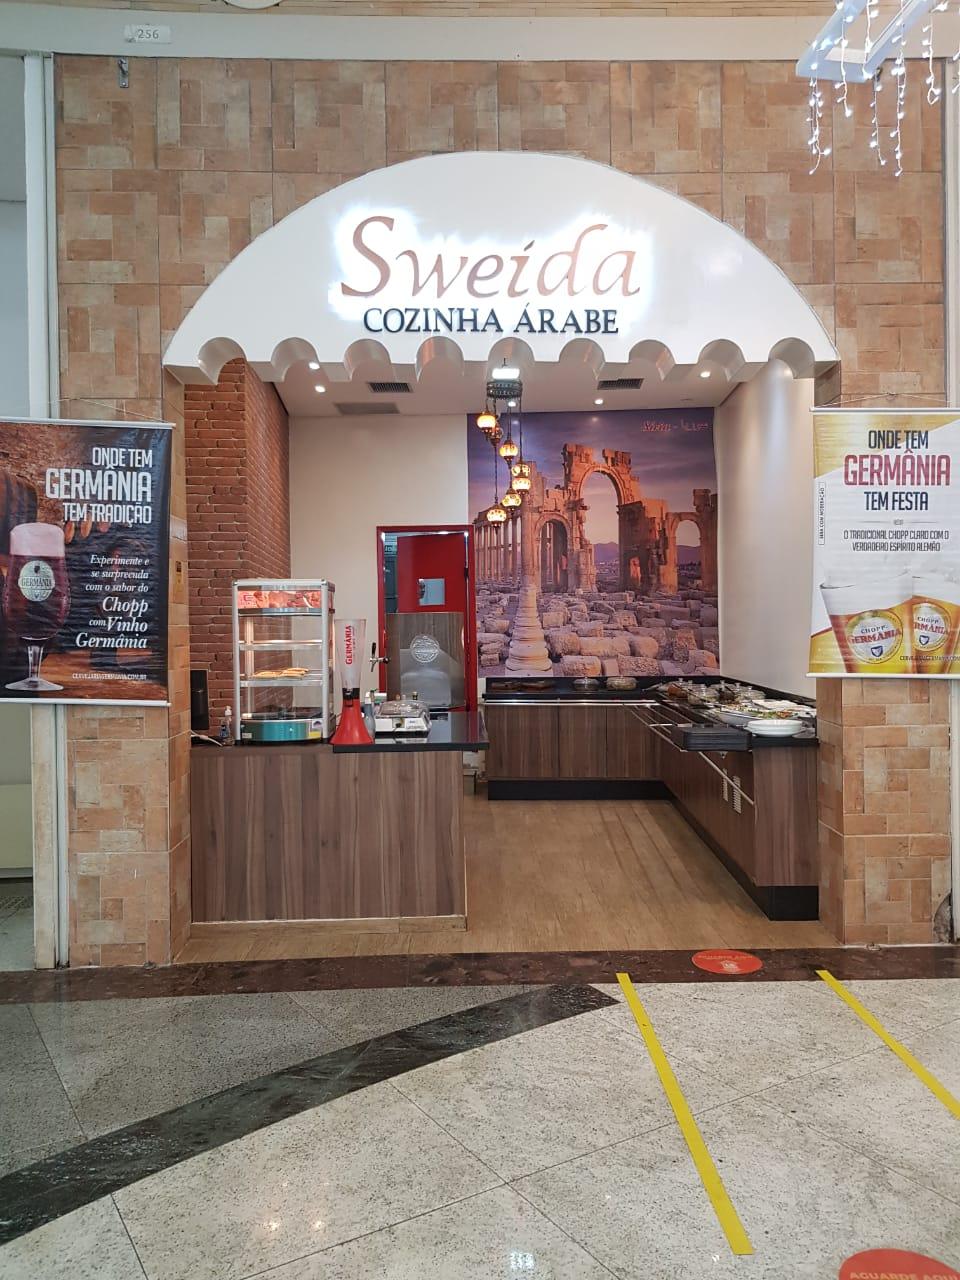 Sweida Cozinha Árabe